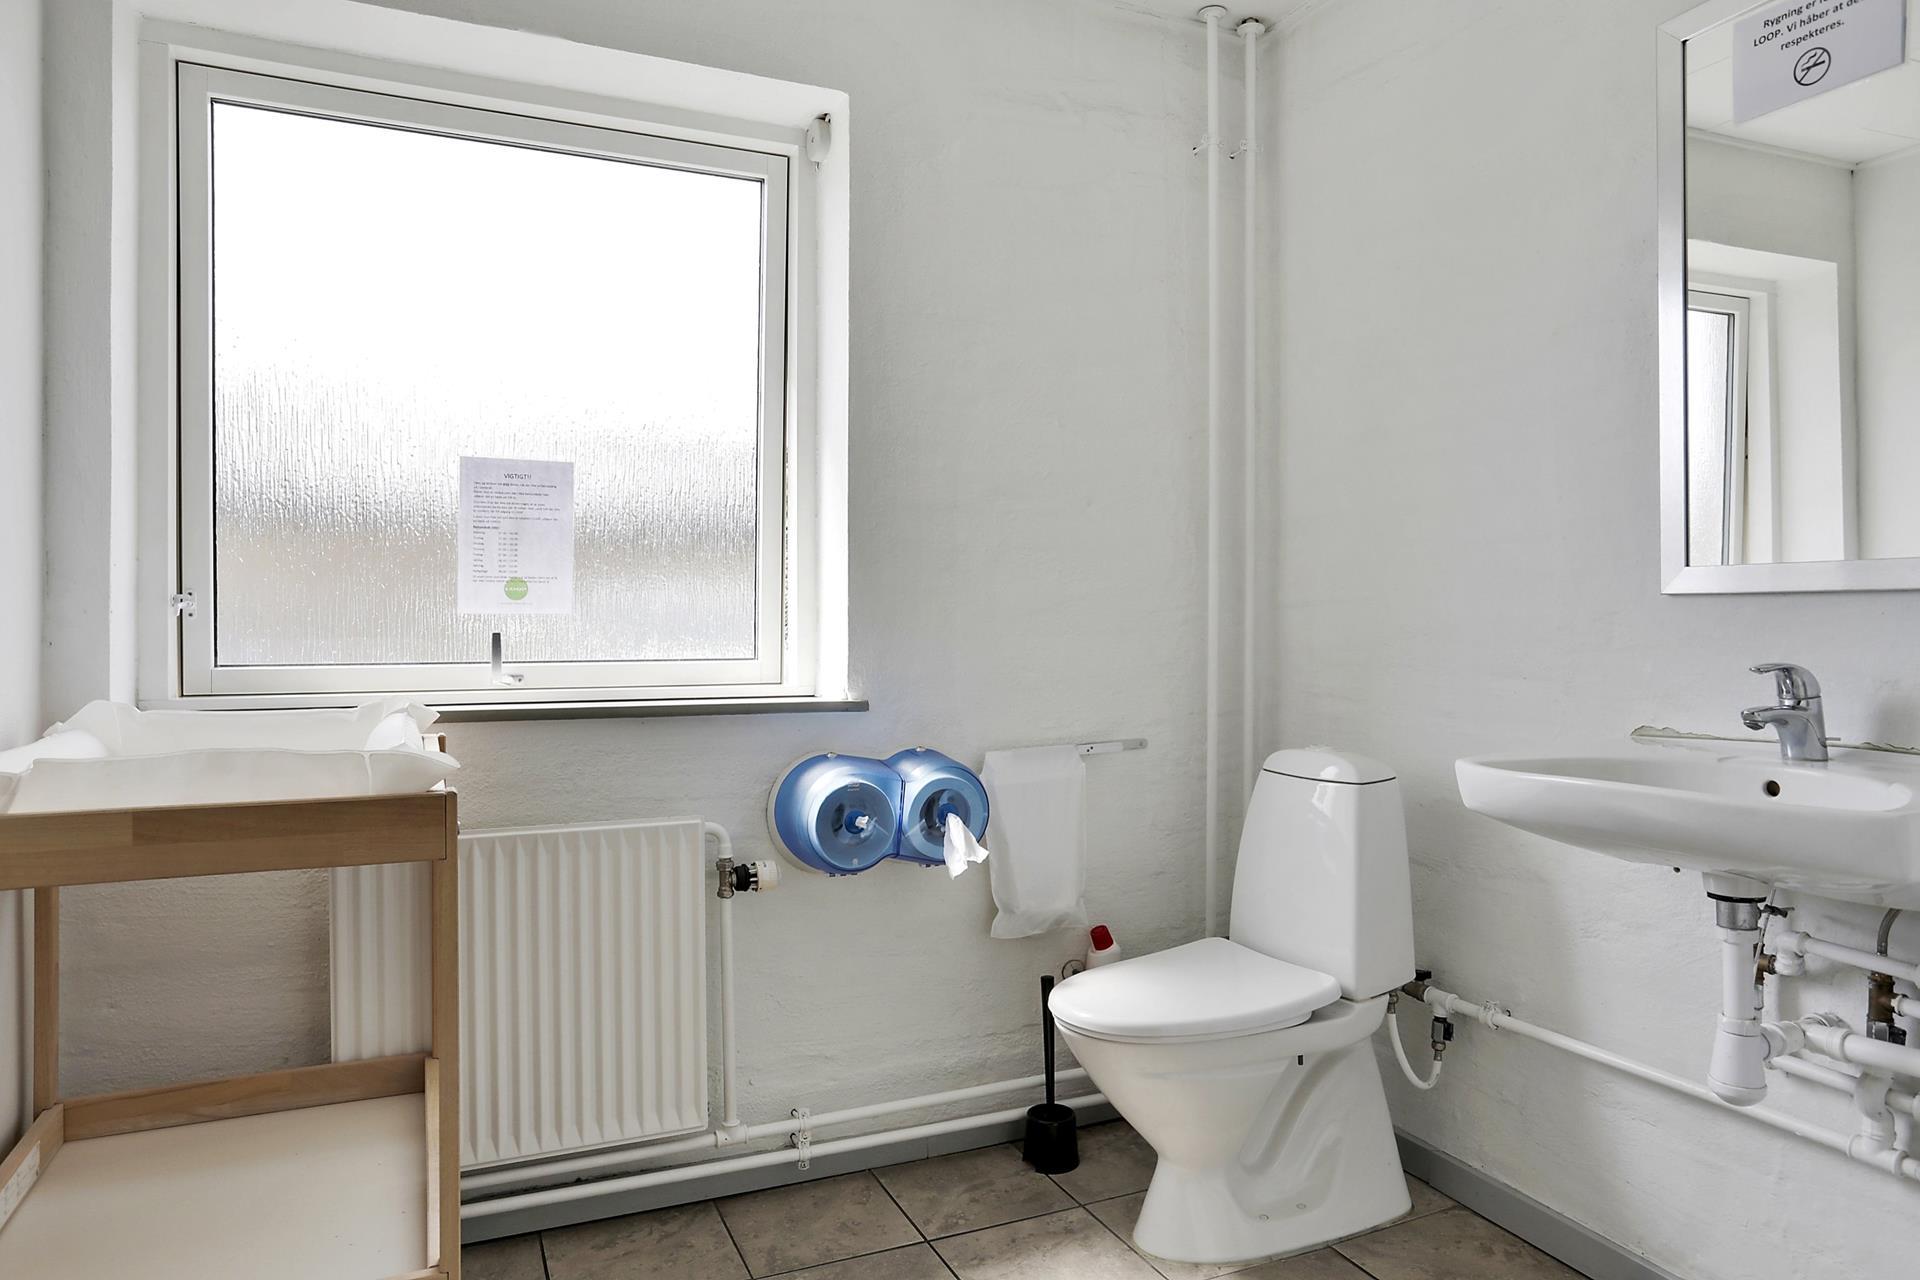 Detail på Falkevej i Viborg - Toilet